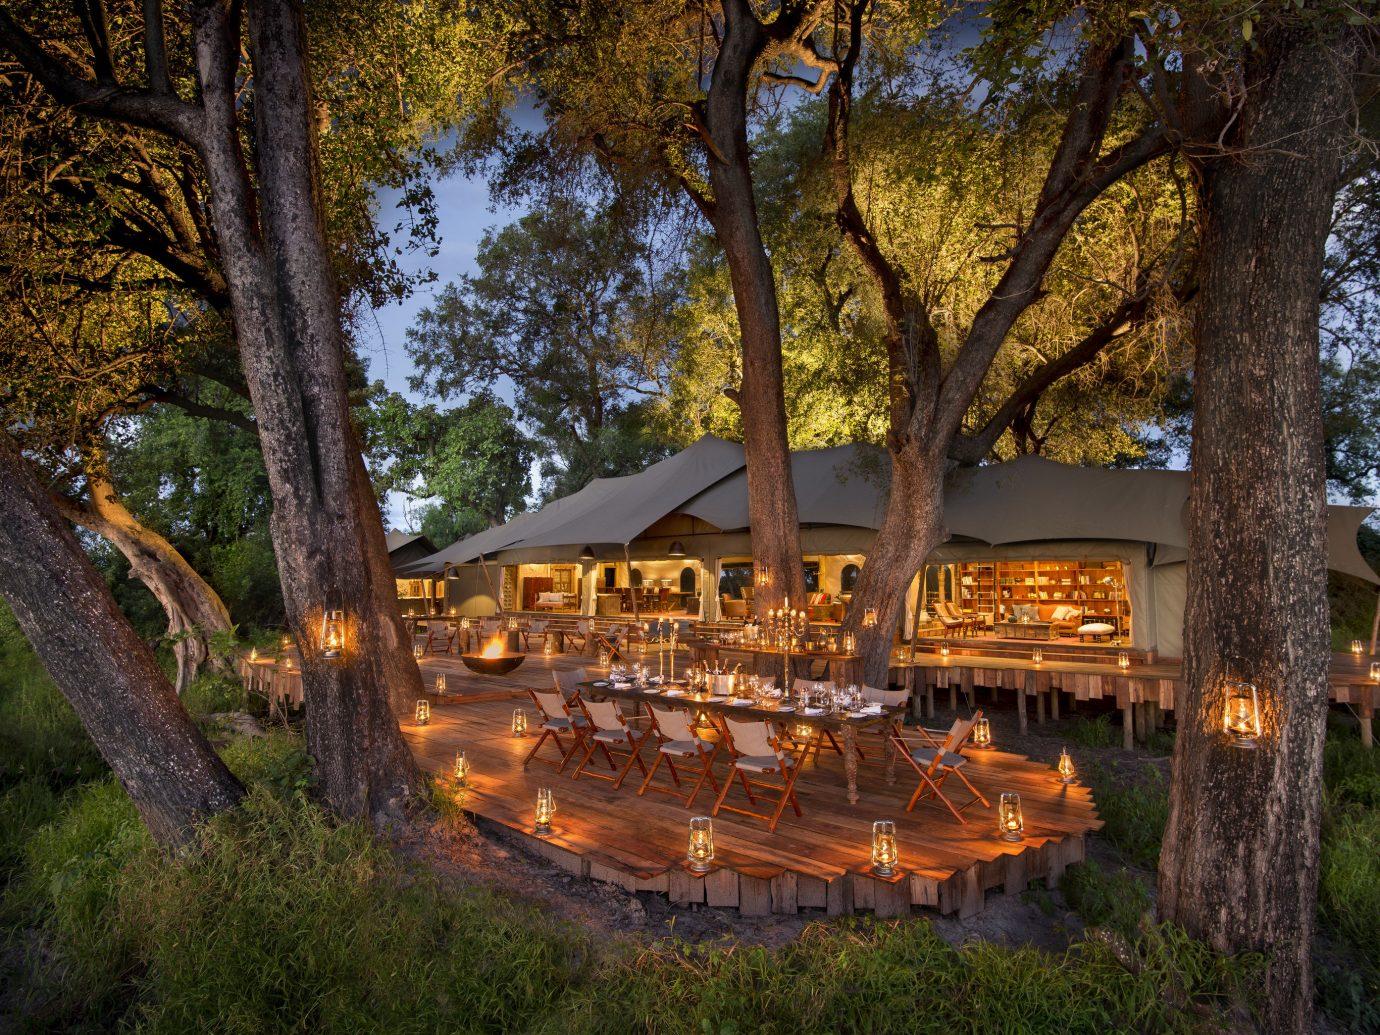 Hotels Trip Ideas tree outdoor grass leaf autumn estate plant landscape lighting park shrine wooded